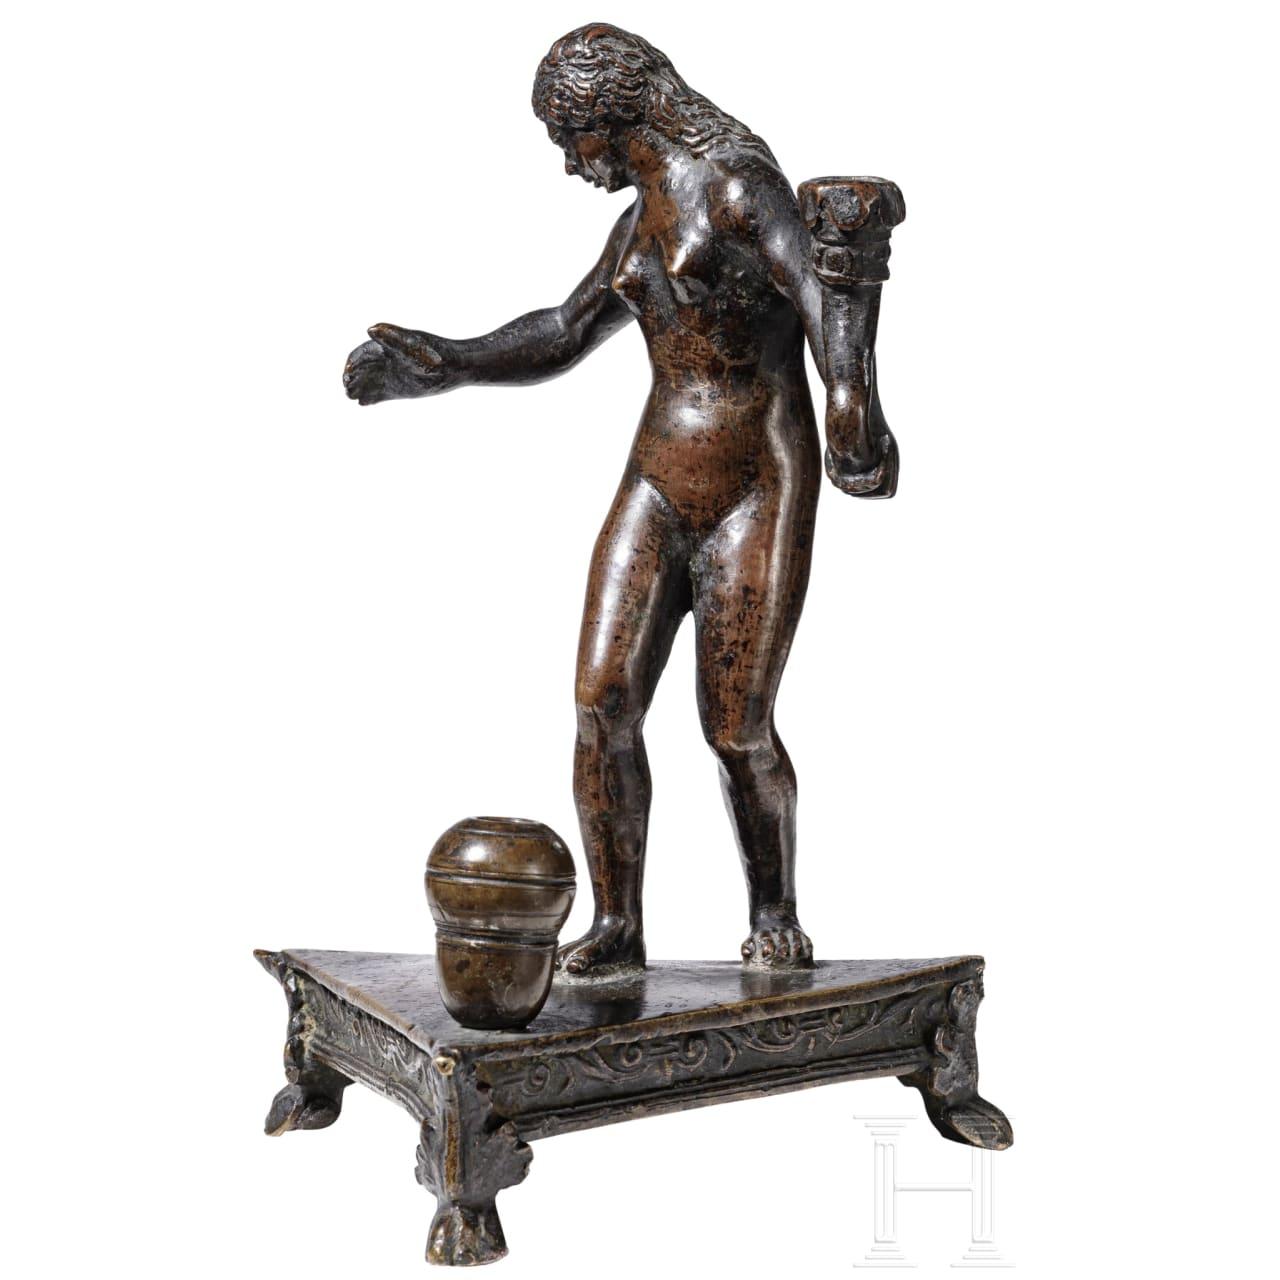 Venus - Tischbronze aus der Werkstatt Andrea Riccios (um 1471-1532, Padua)